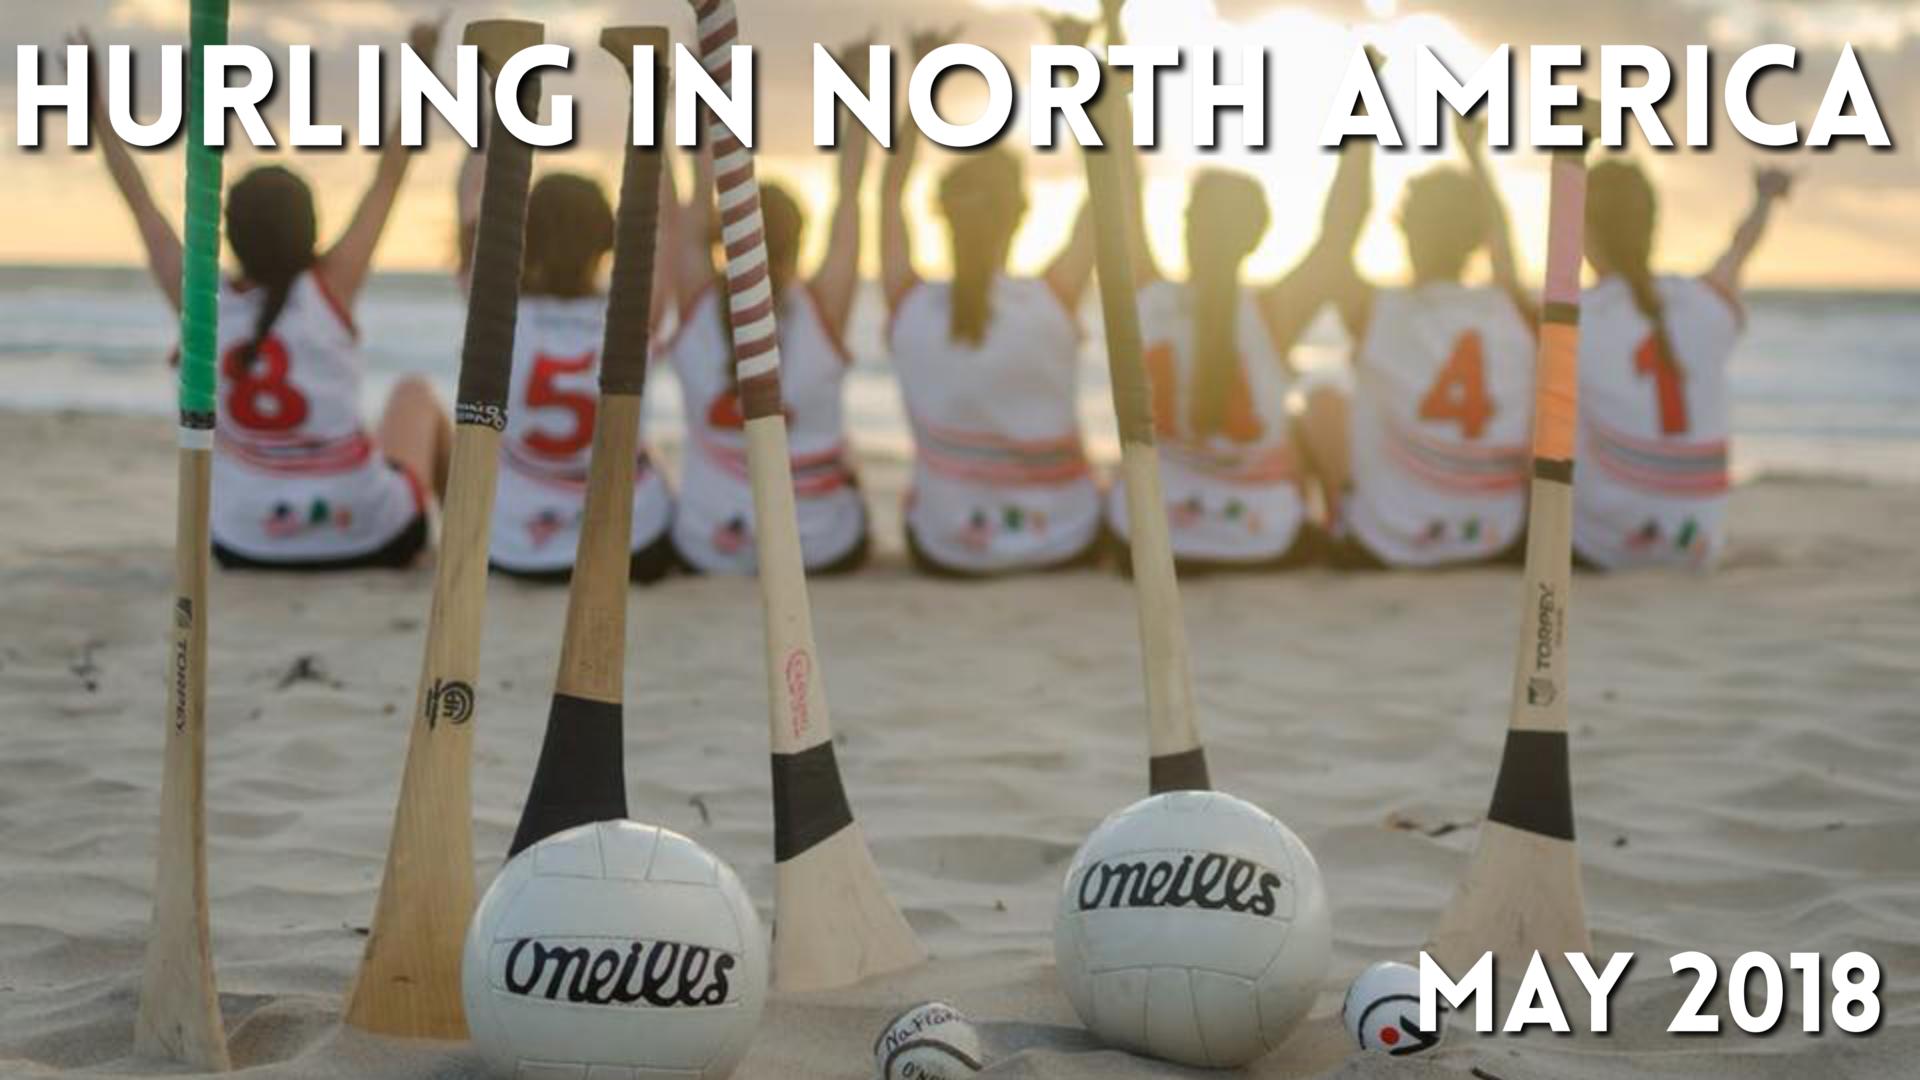 Hurling in North America News May 2018 facebook